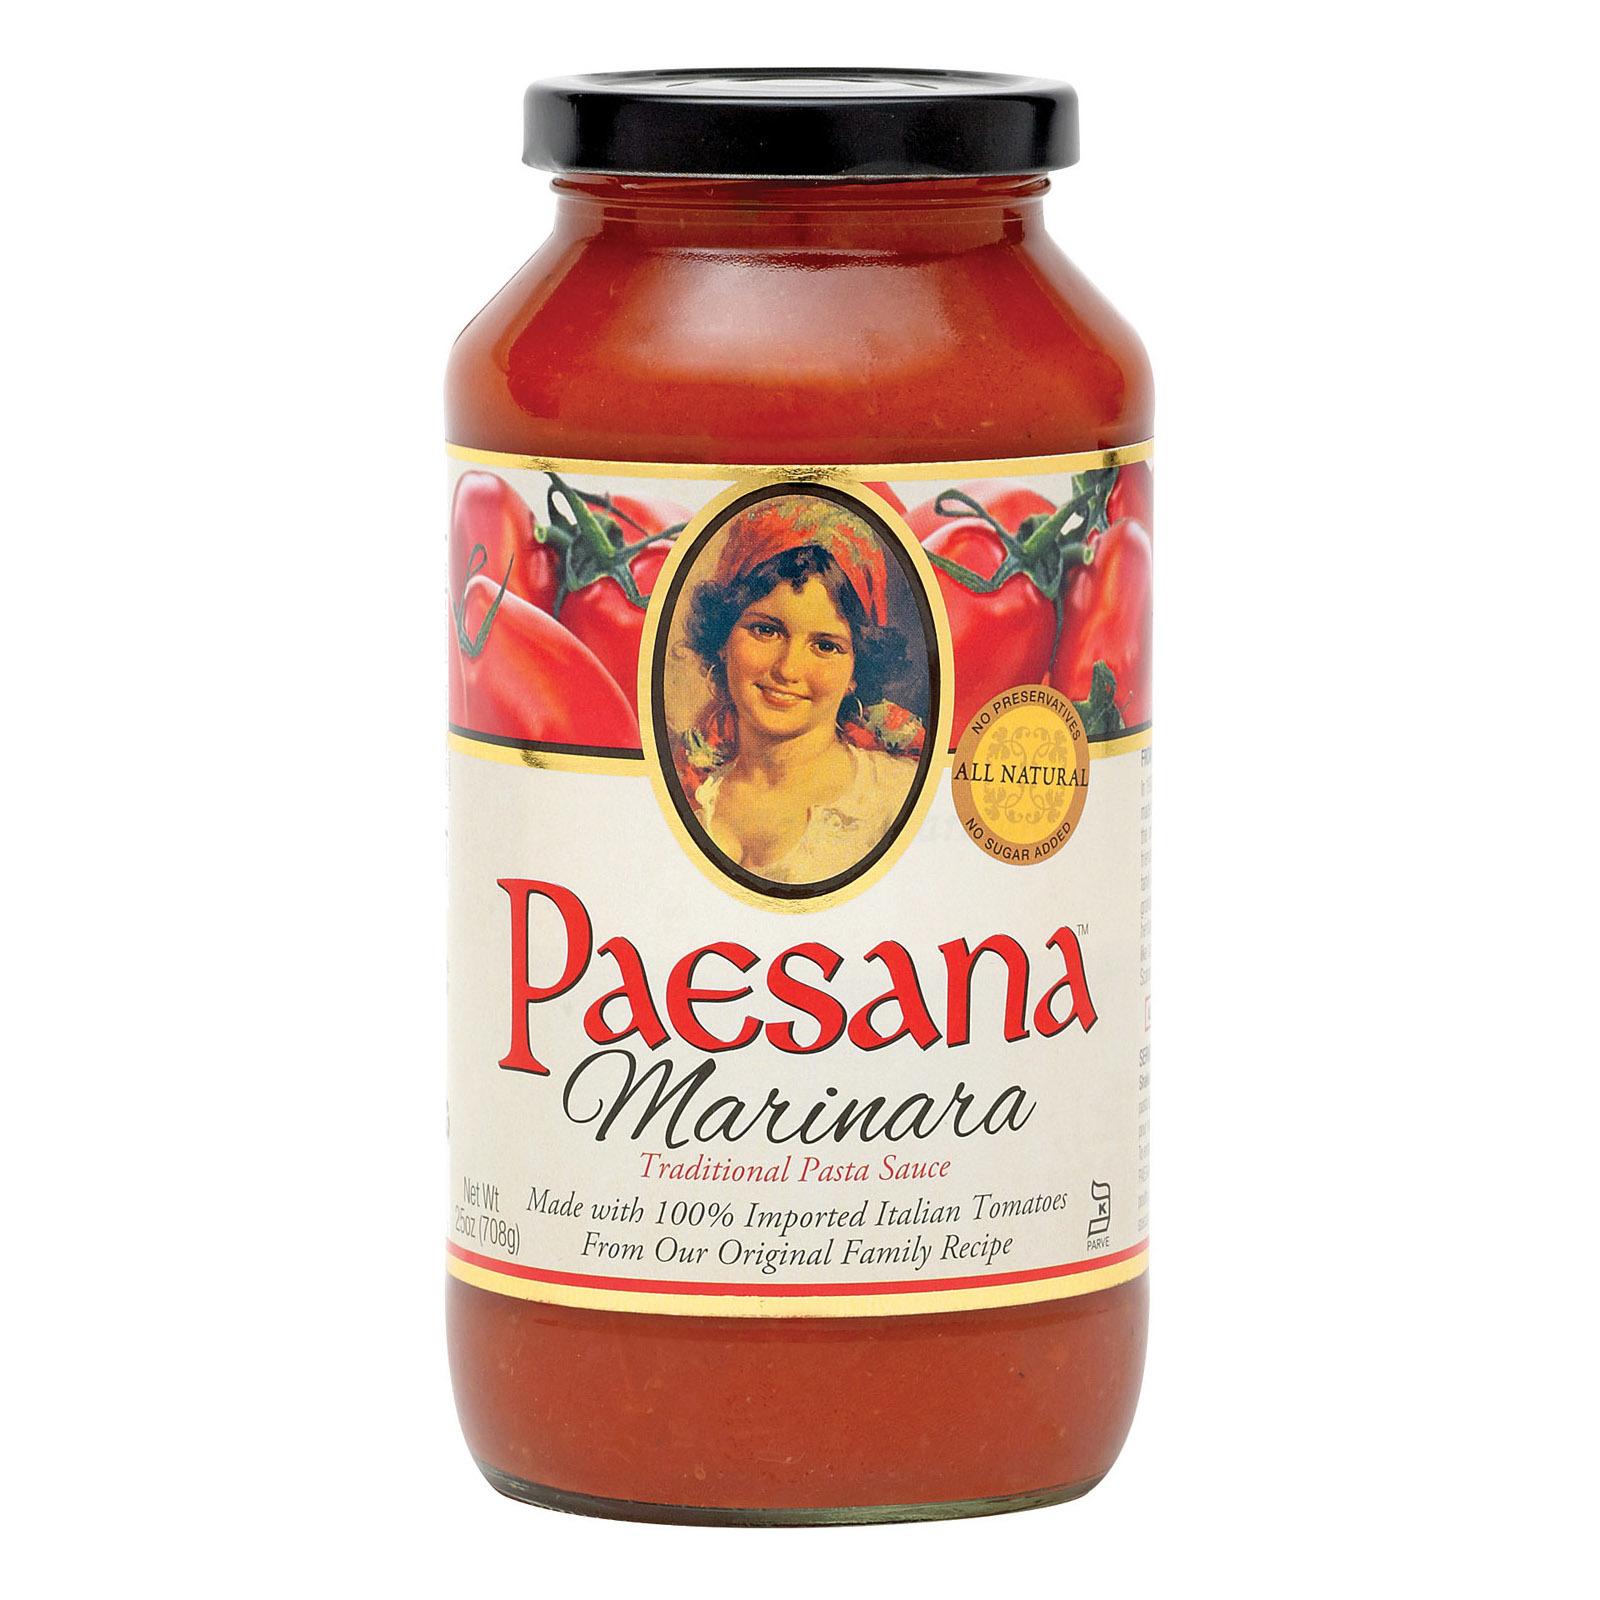 Paesana Traditional Pasta Sauce - Marinara - Case of 6 - 25 Fl oz.